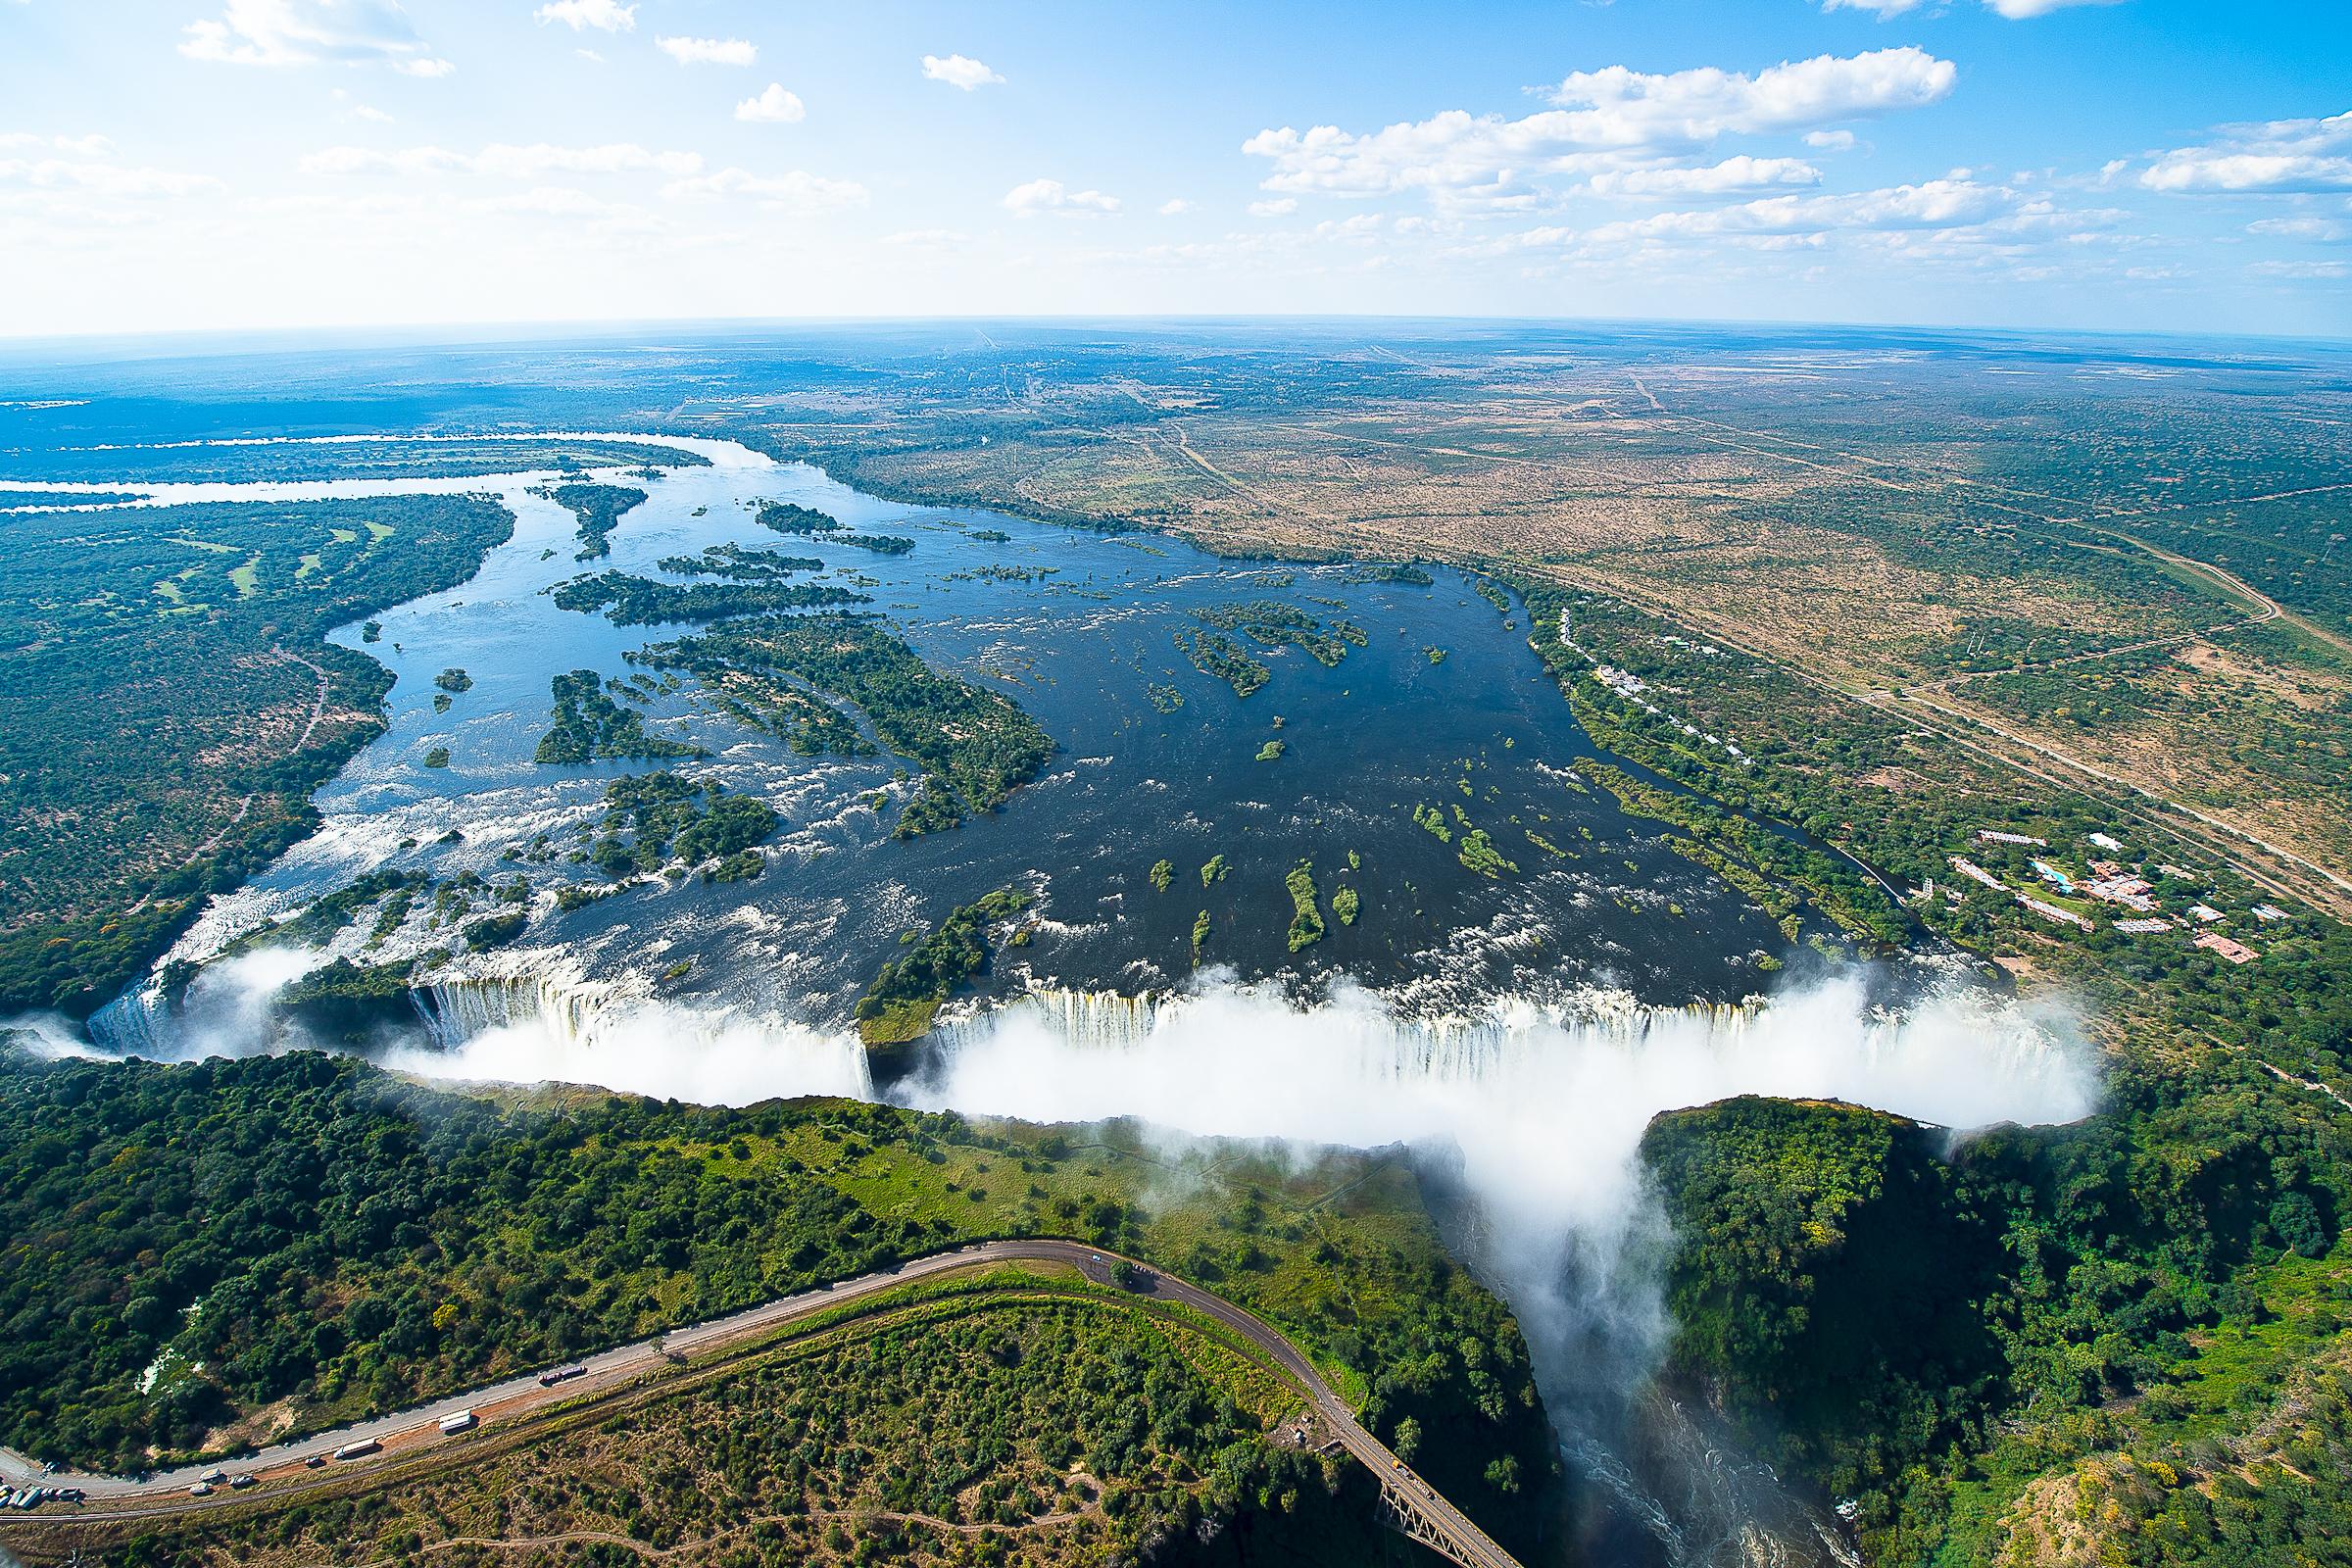 BEST OF ZIMBABWE & BOTSWANA